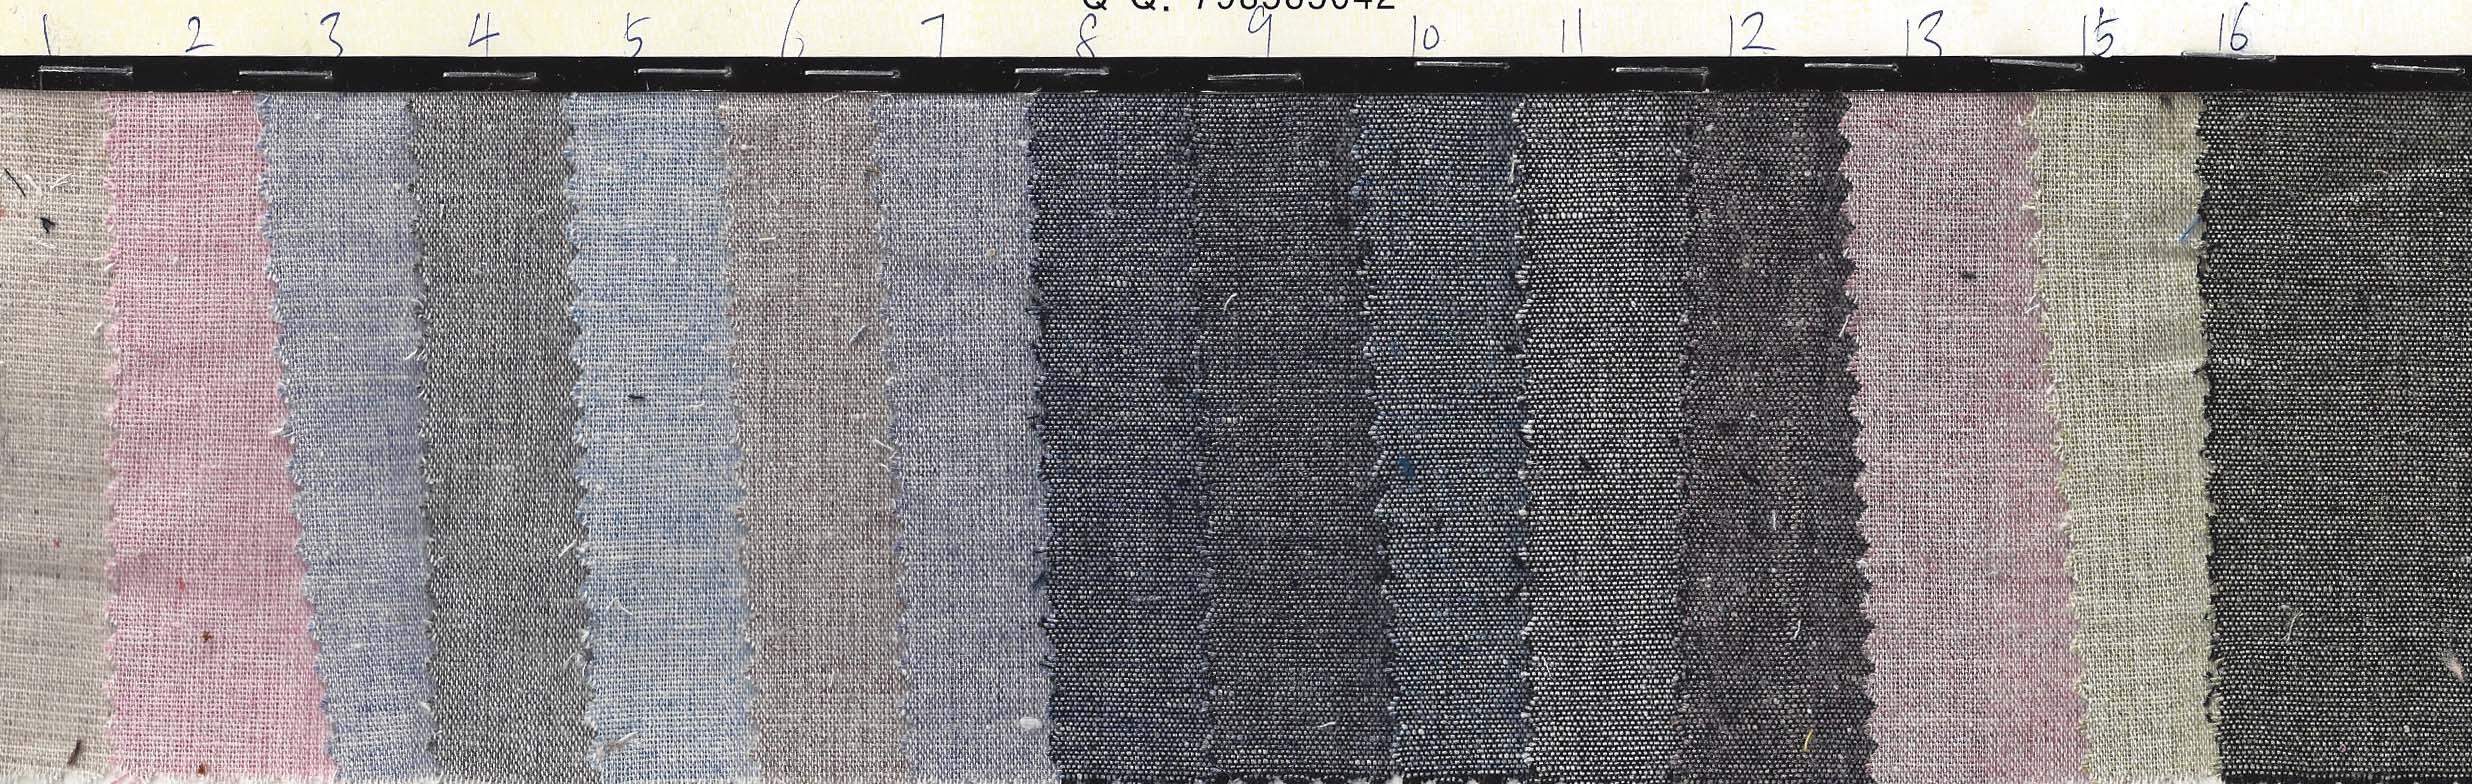 Sheng Ye Textile S516.jpg